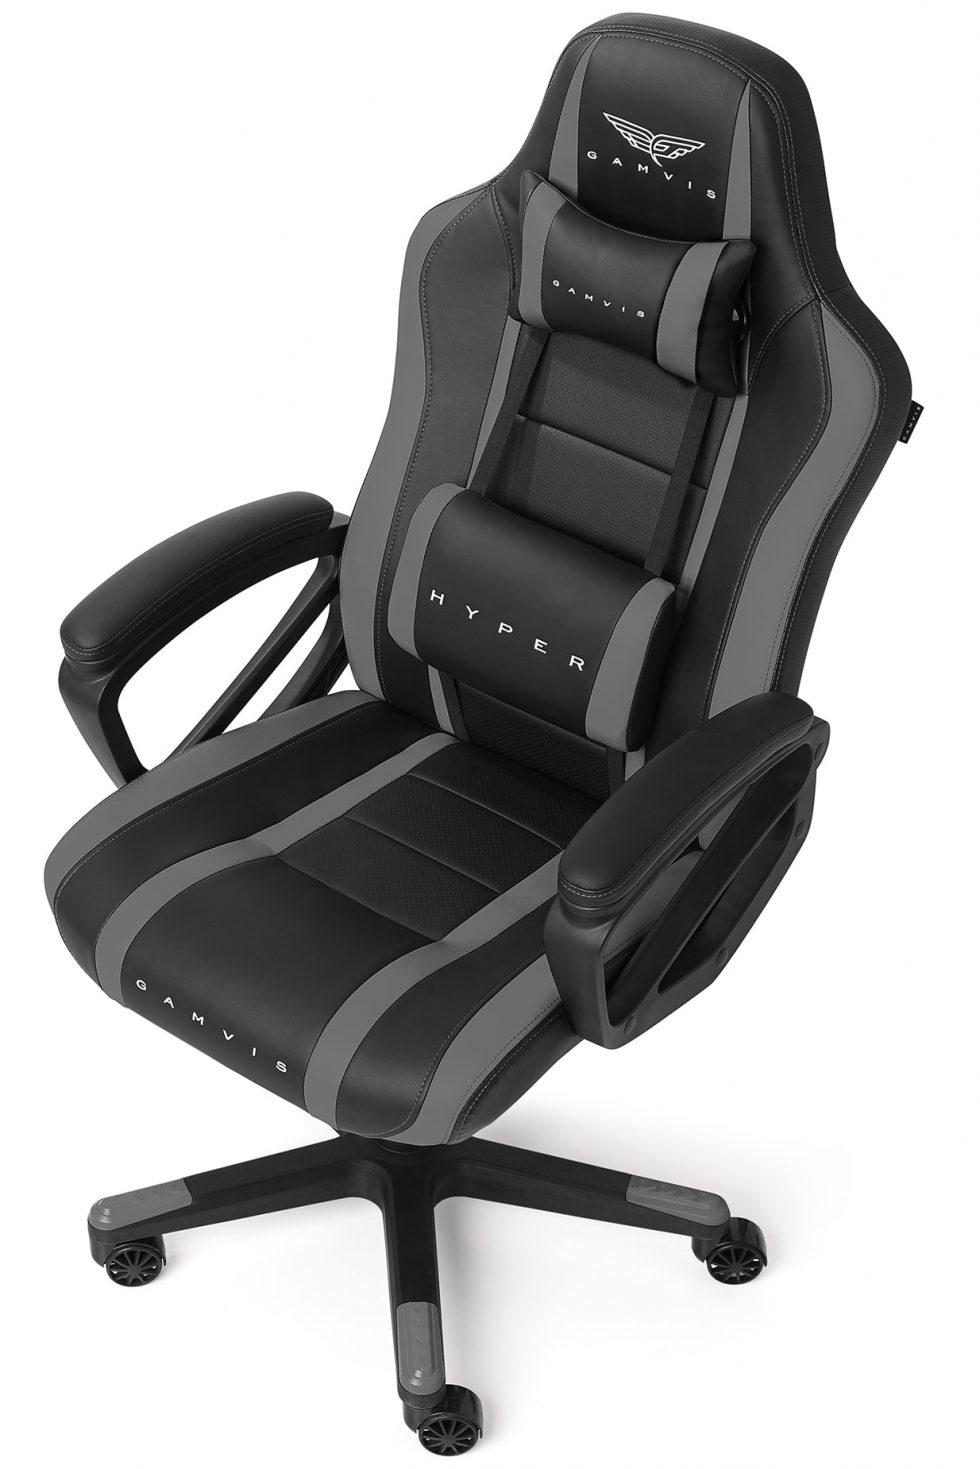 Gamvis Hyper Gaming Chair Black Gray